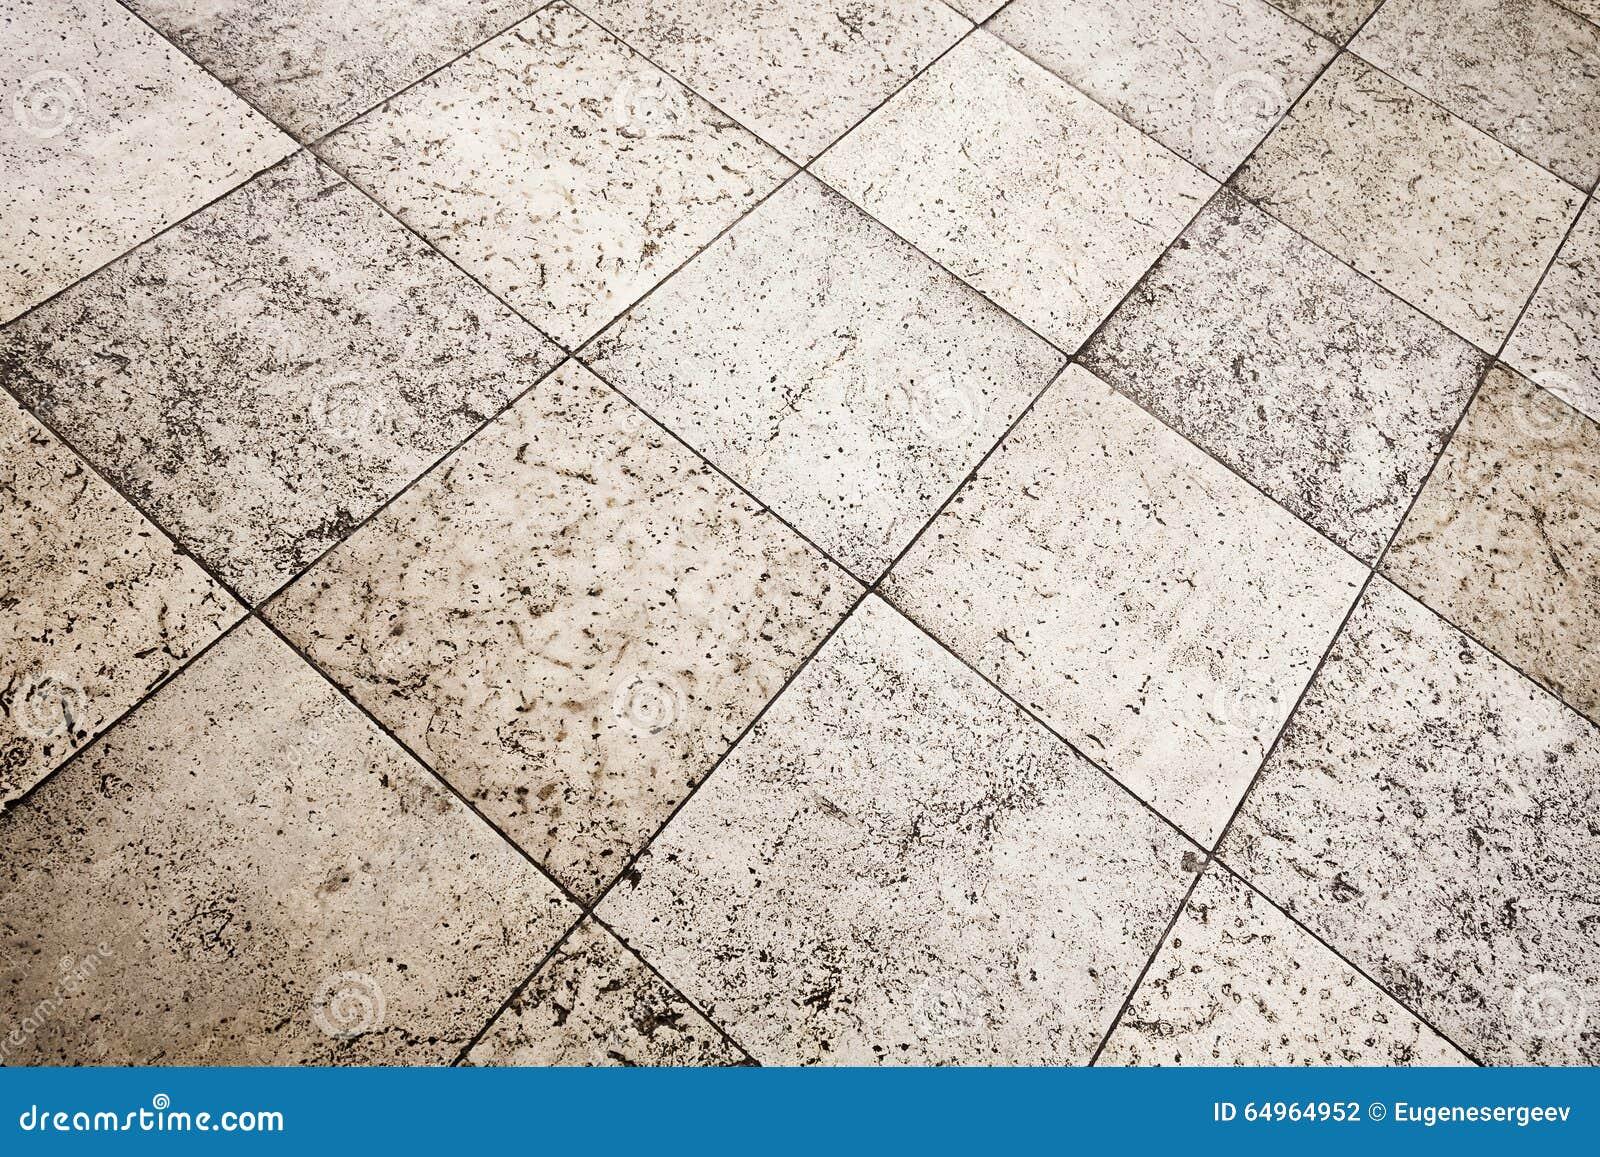 alte braune graue steinboden tilingsbeschaffenheit stockfoto bild 64964952. Black Bedroom Furniture Sets. Home Design Ideas